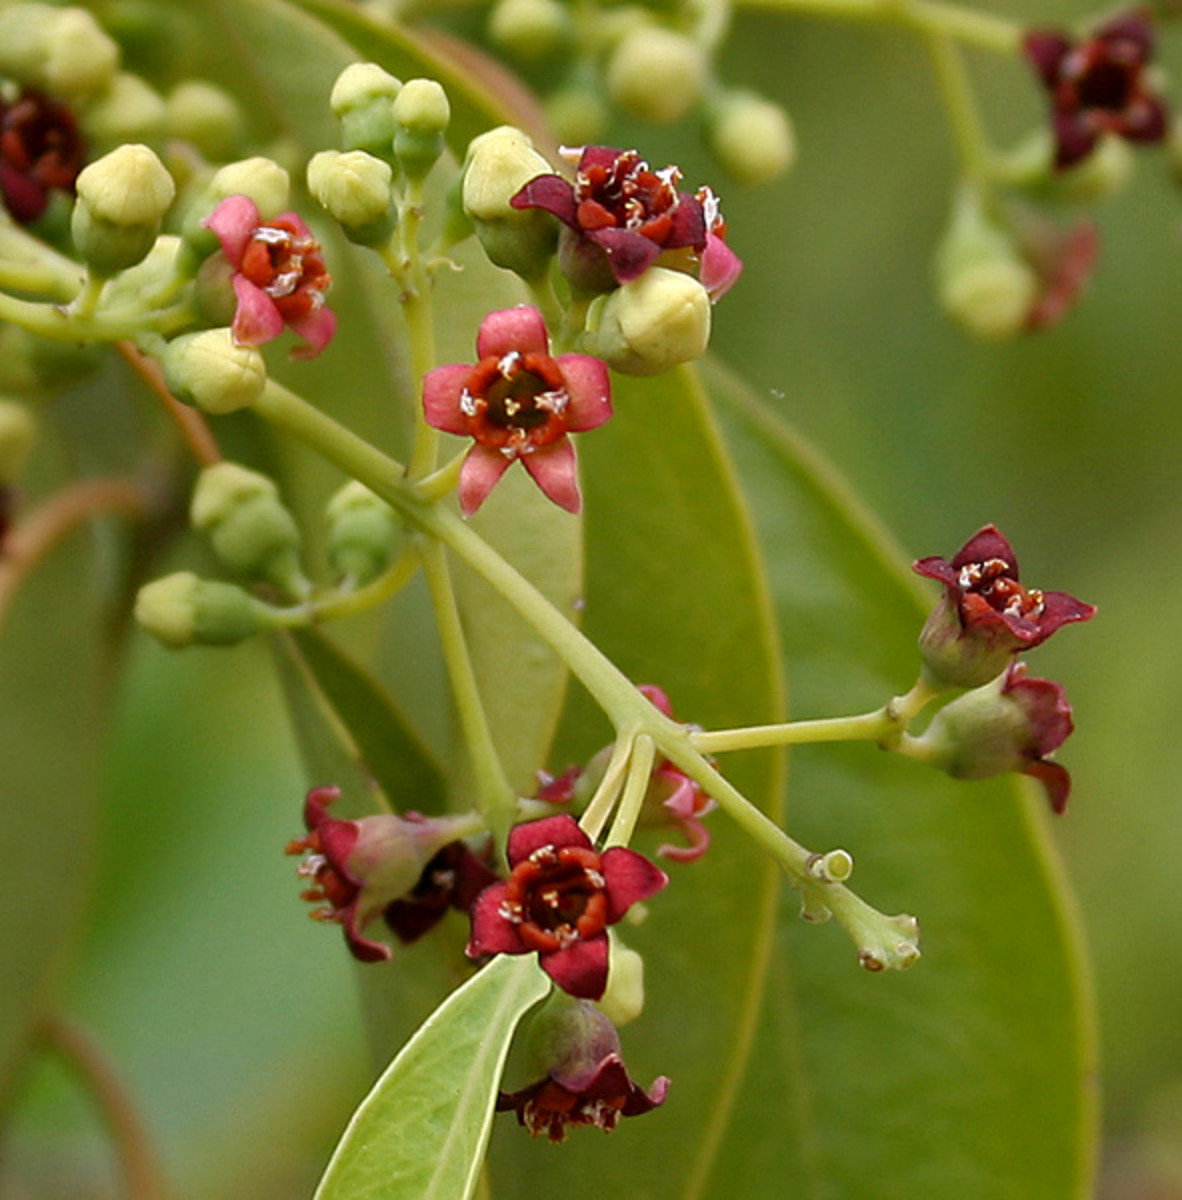 White or East Indian Sandalwood or Chandan (Santalum album) produces Sandalwood essential oil.